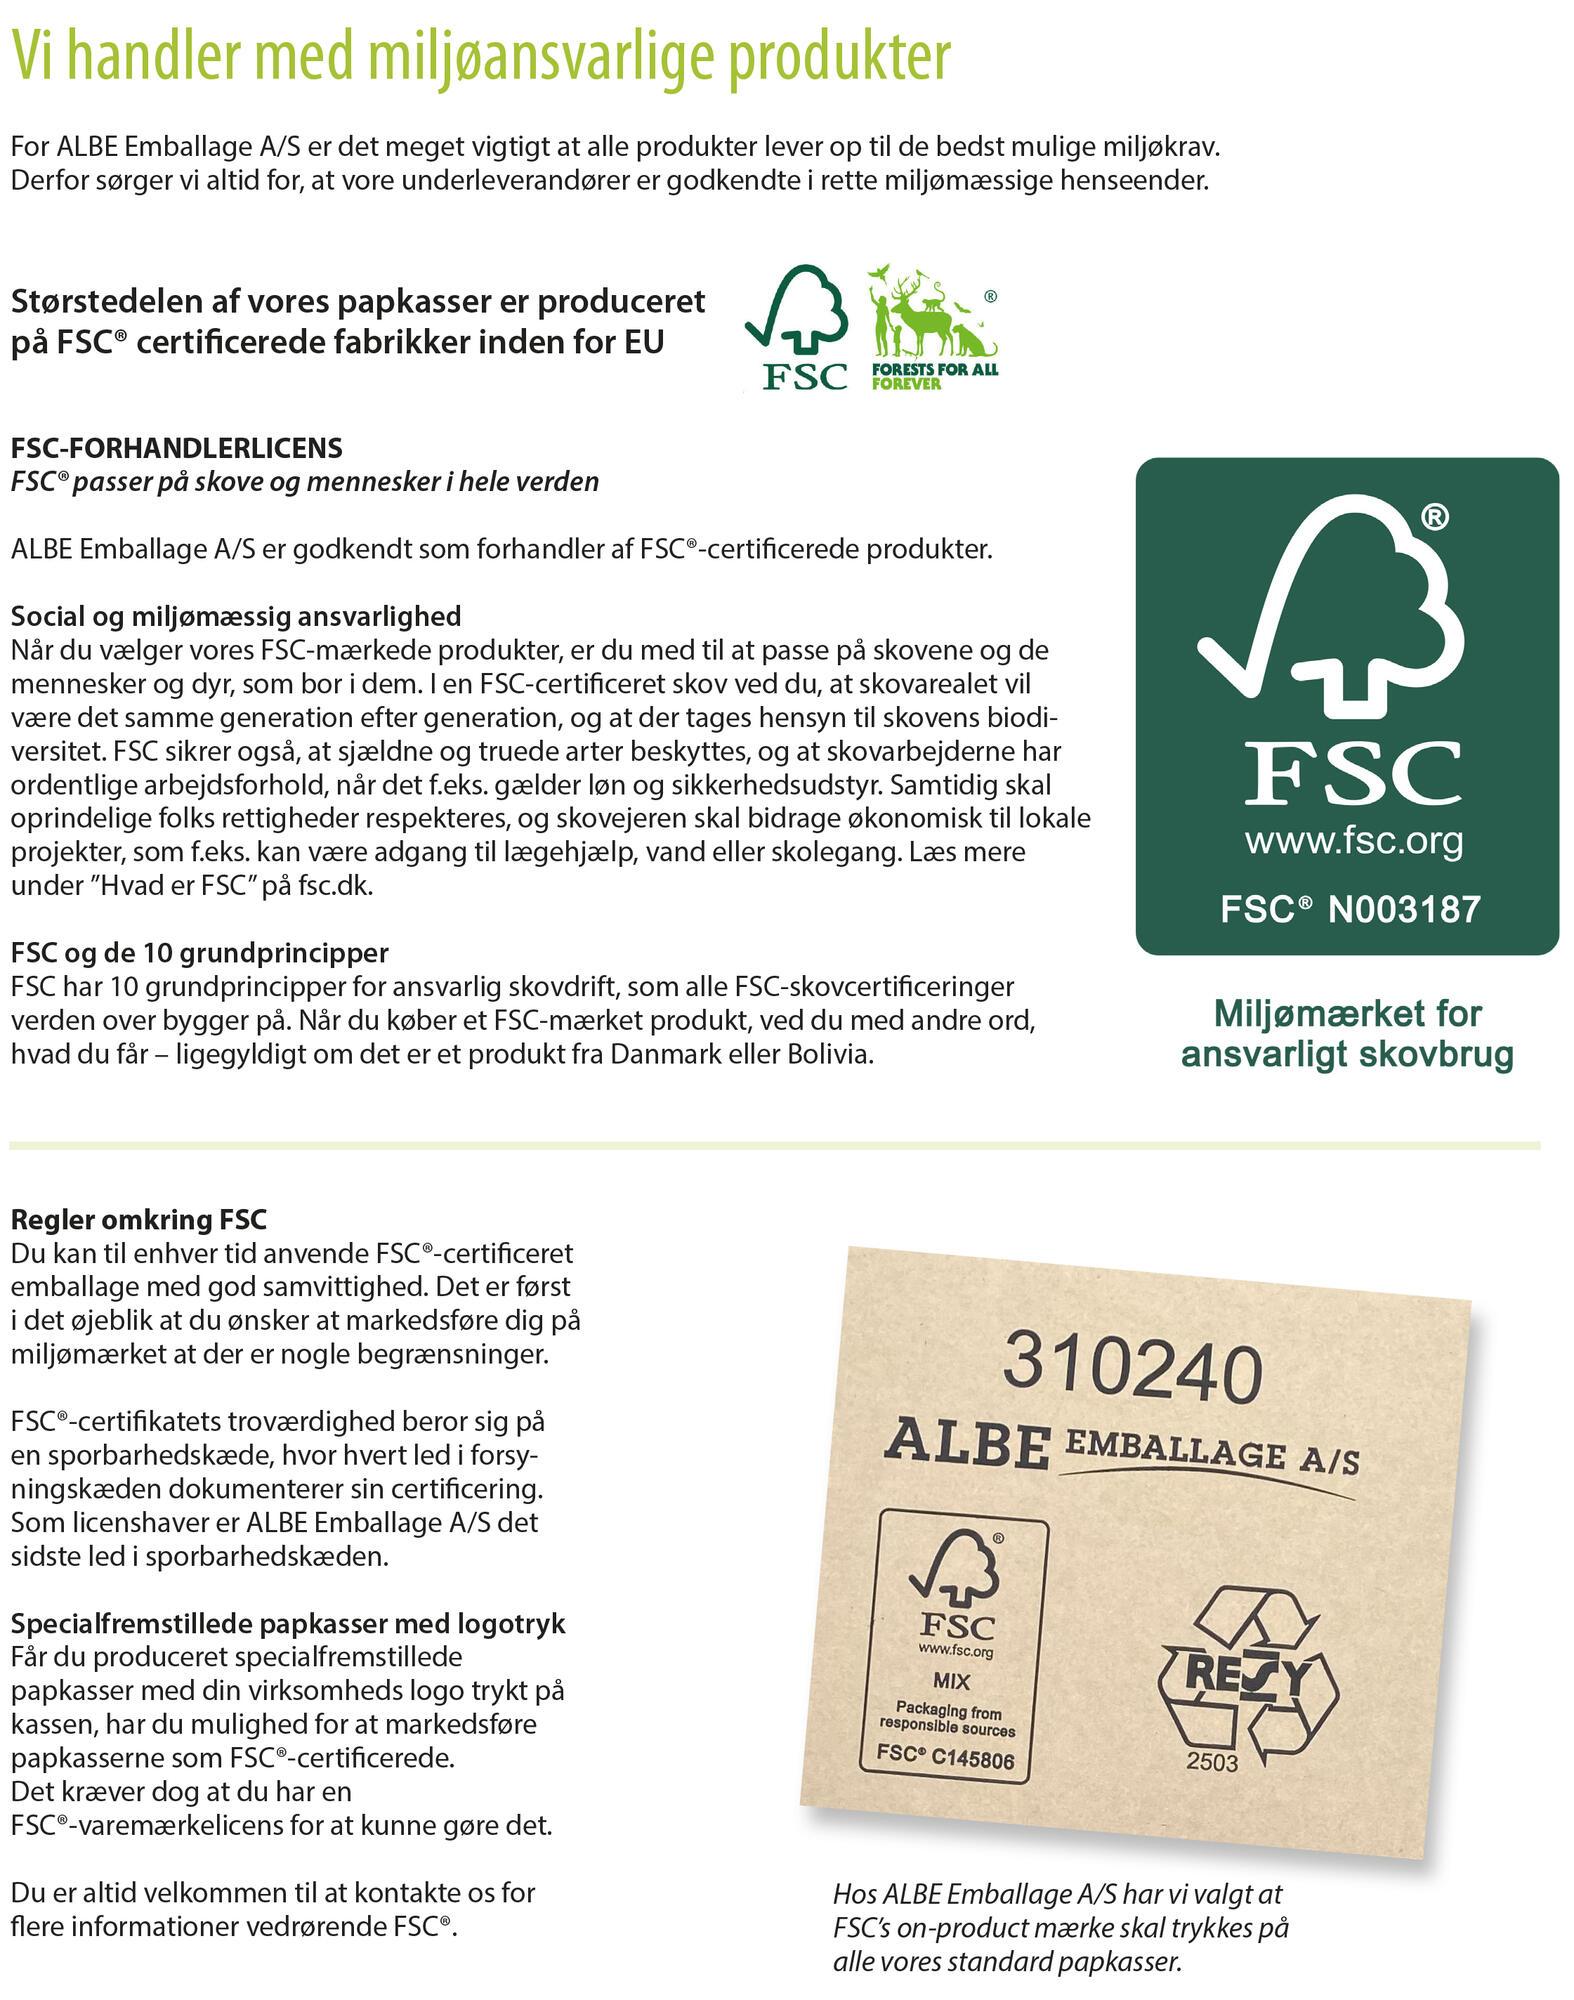 FSC ALBE Emballage